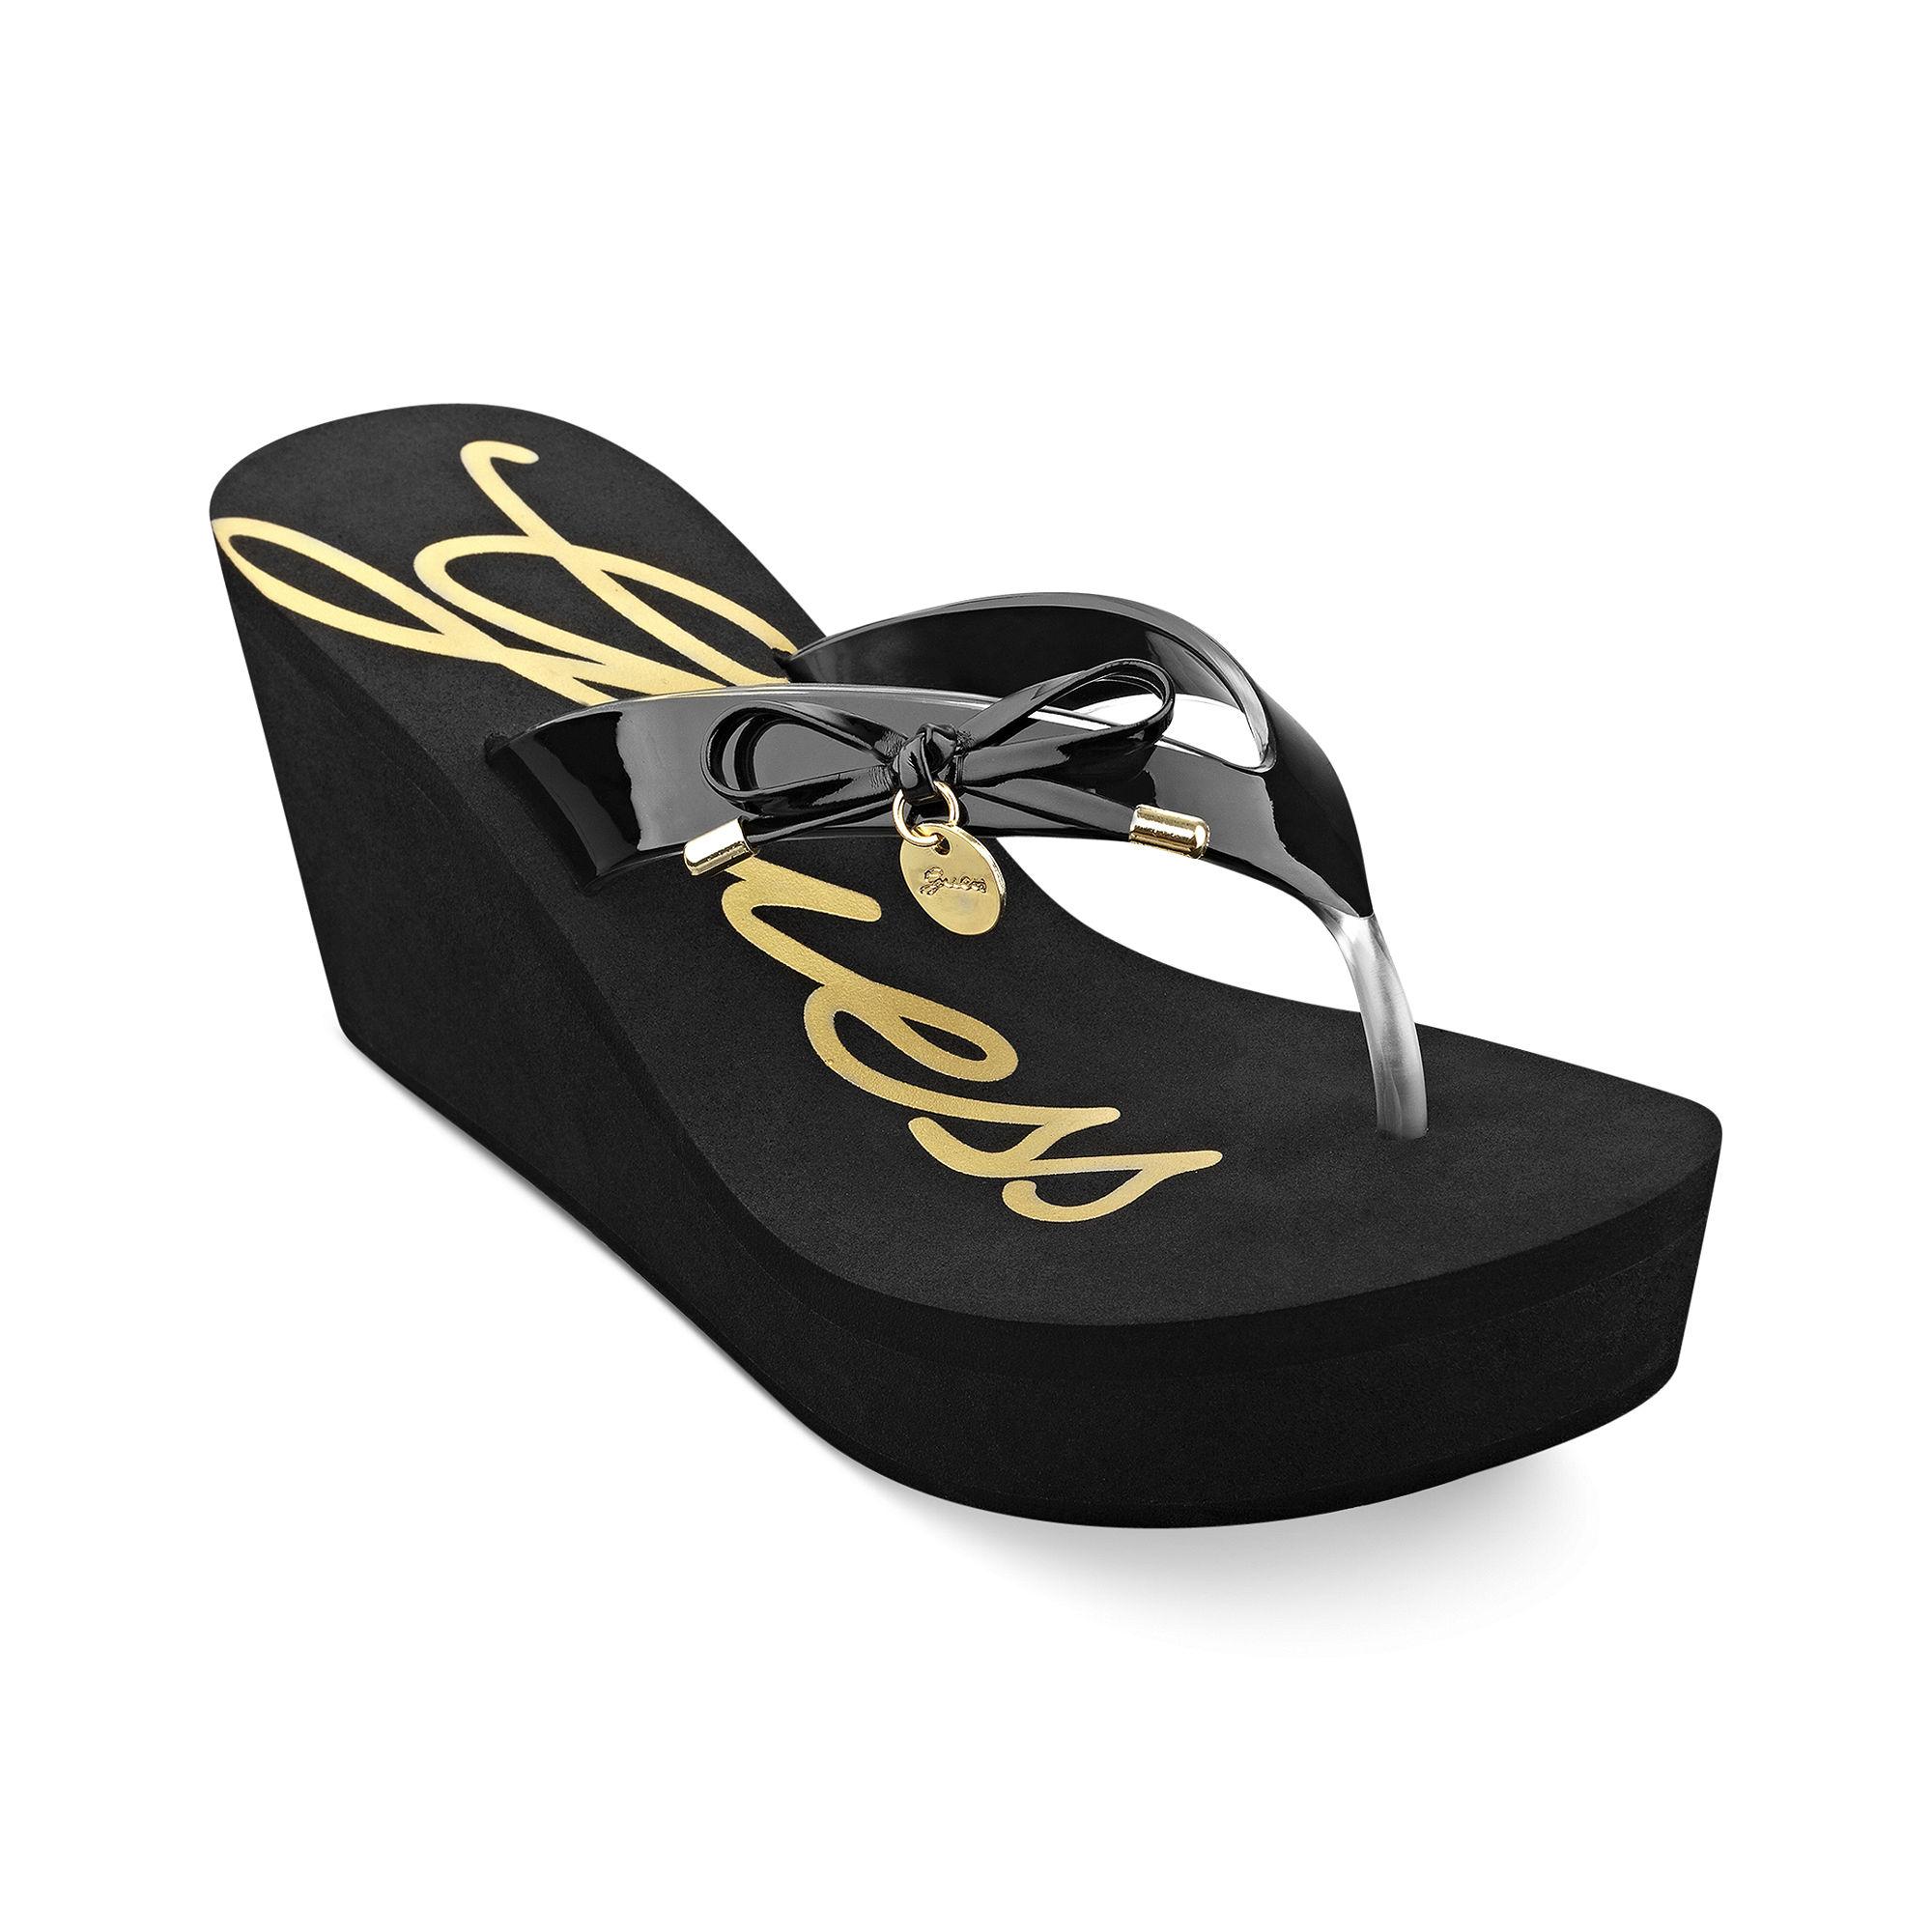 837d47296be0b1 Lyst - Guess Shoes Sorliea Platform Wedge Thong Sandals in Black